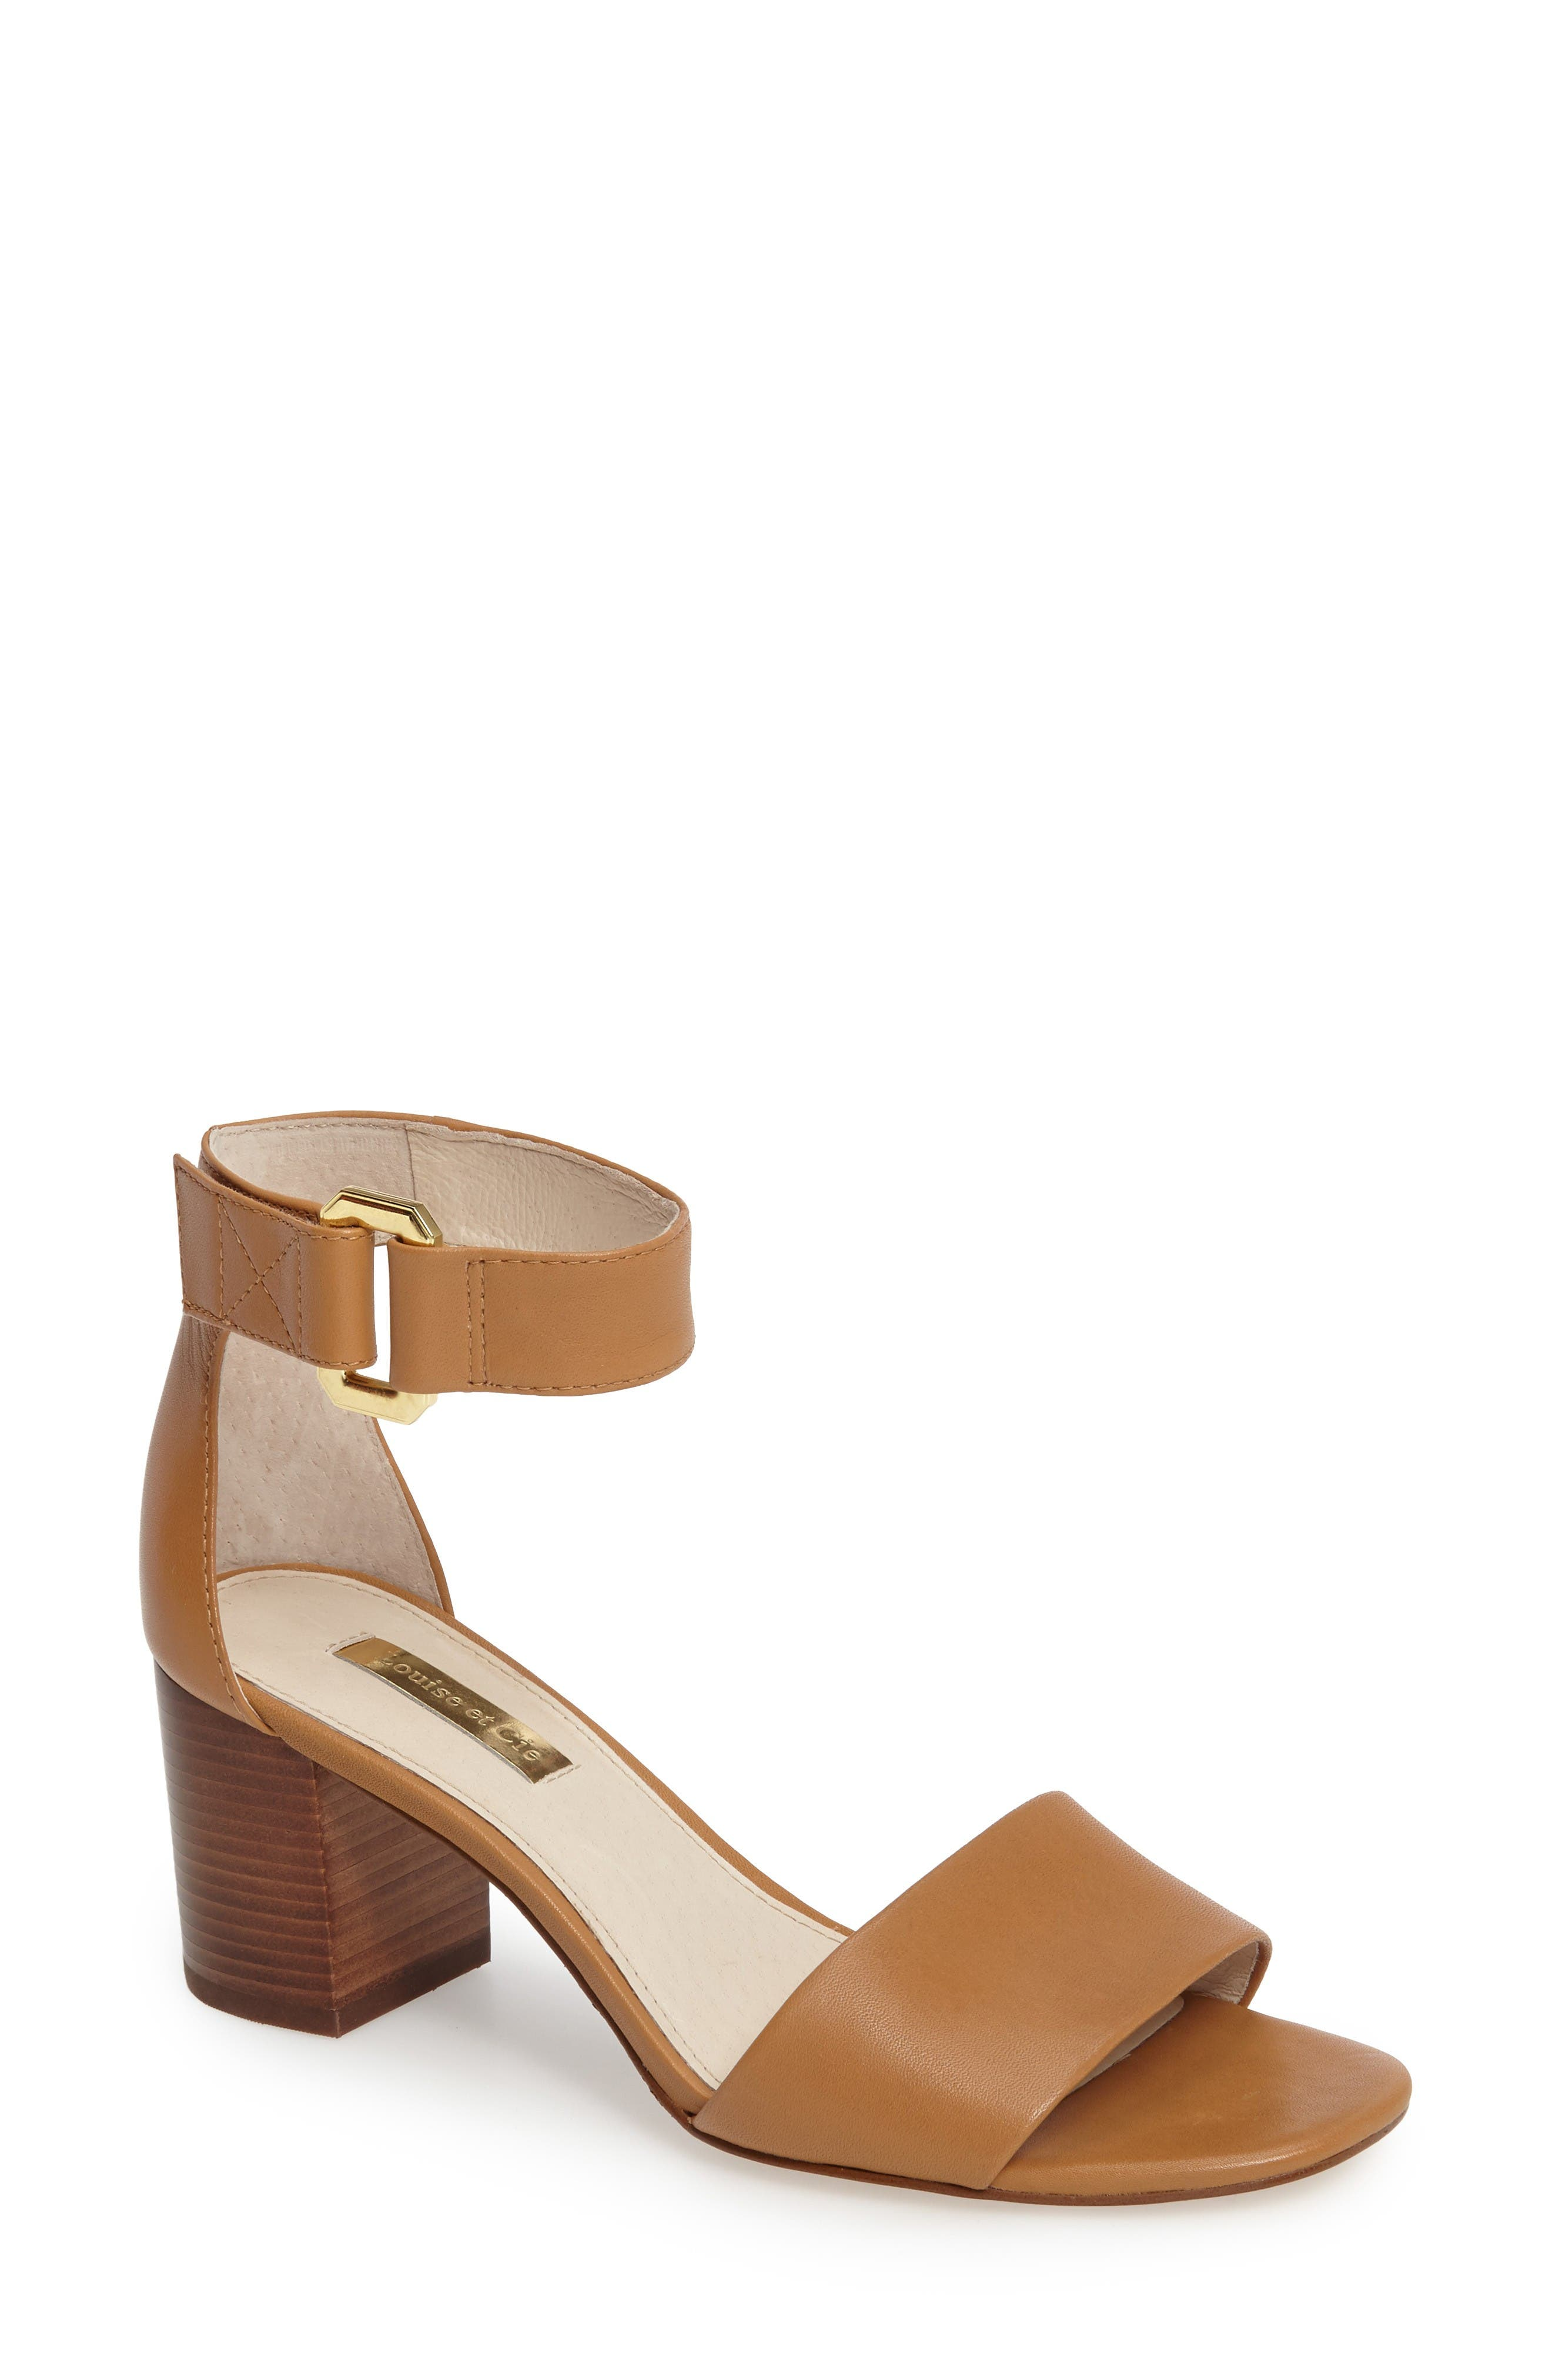 Louise et Cie Kambria Block Heel Sandal (Women)